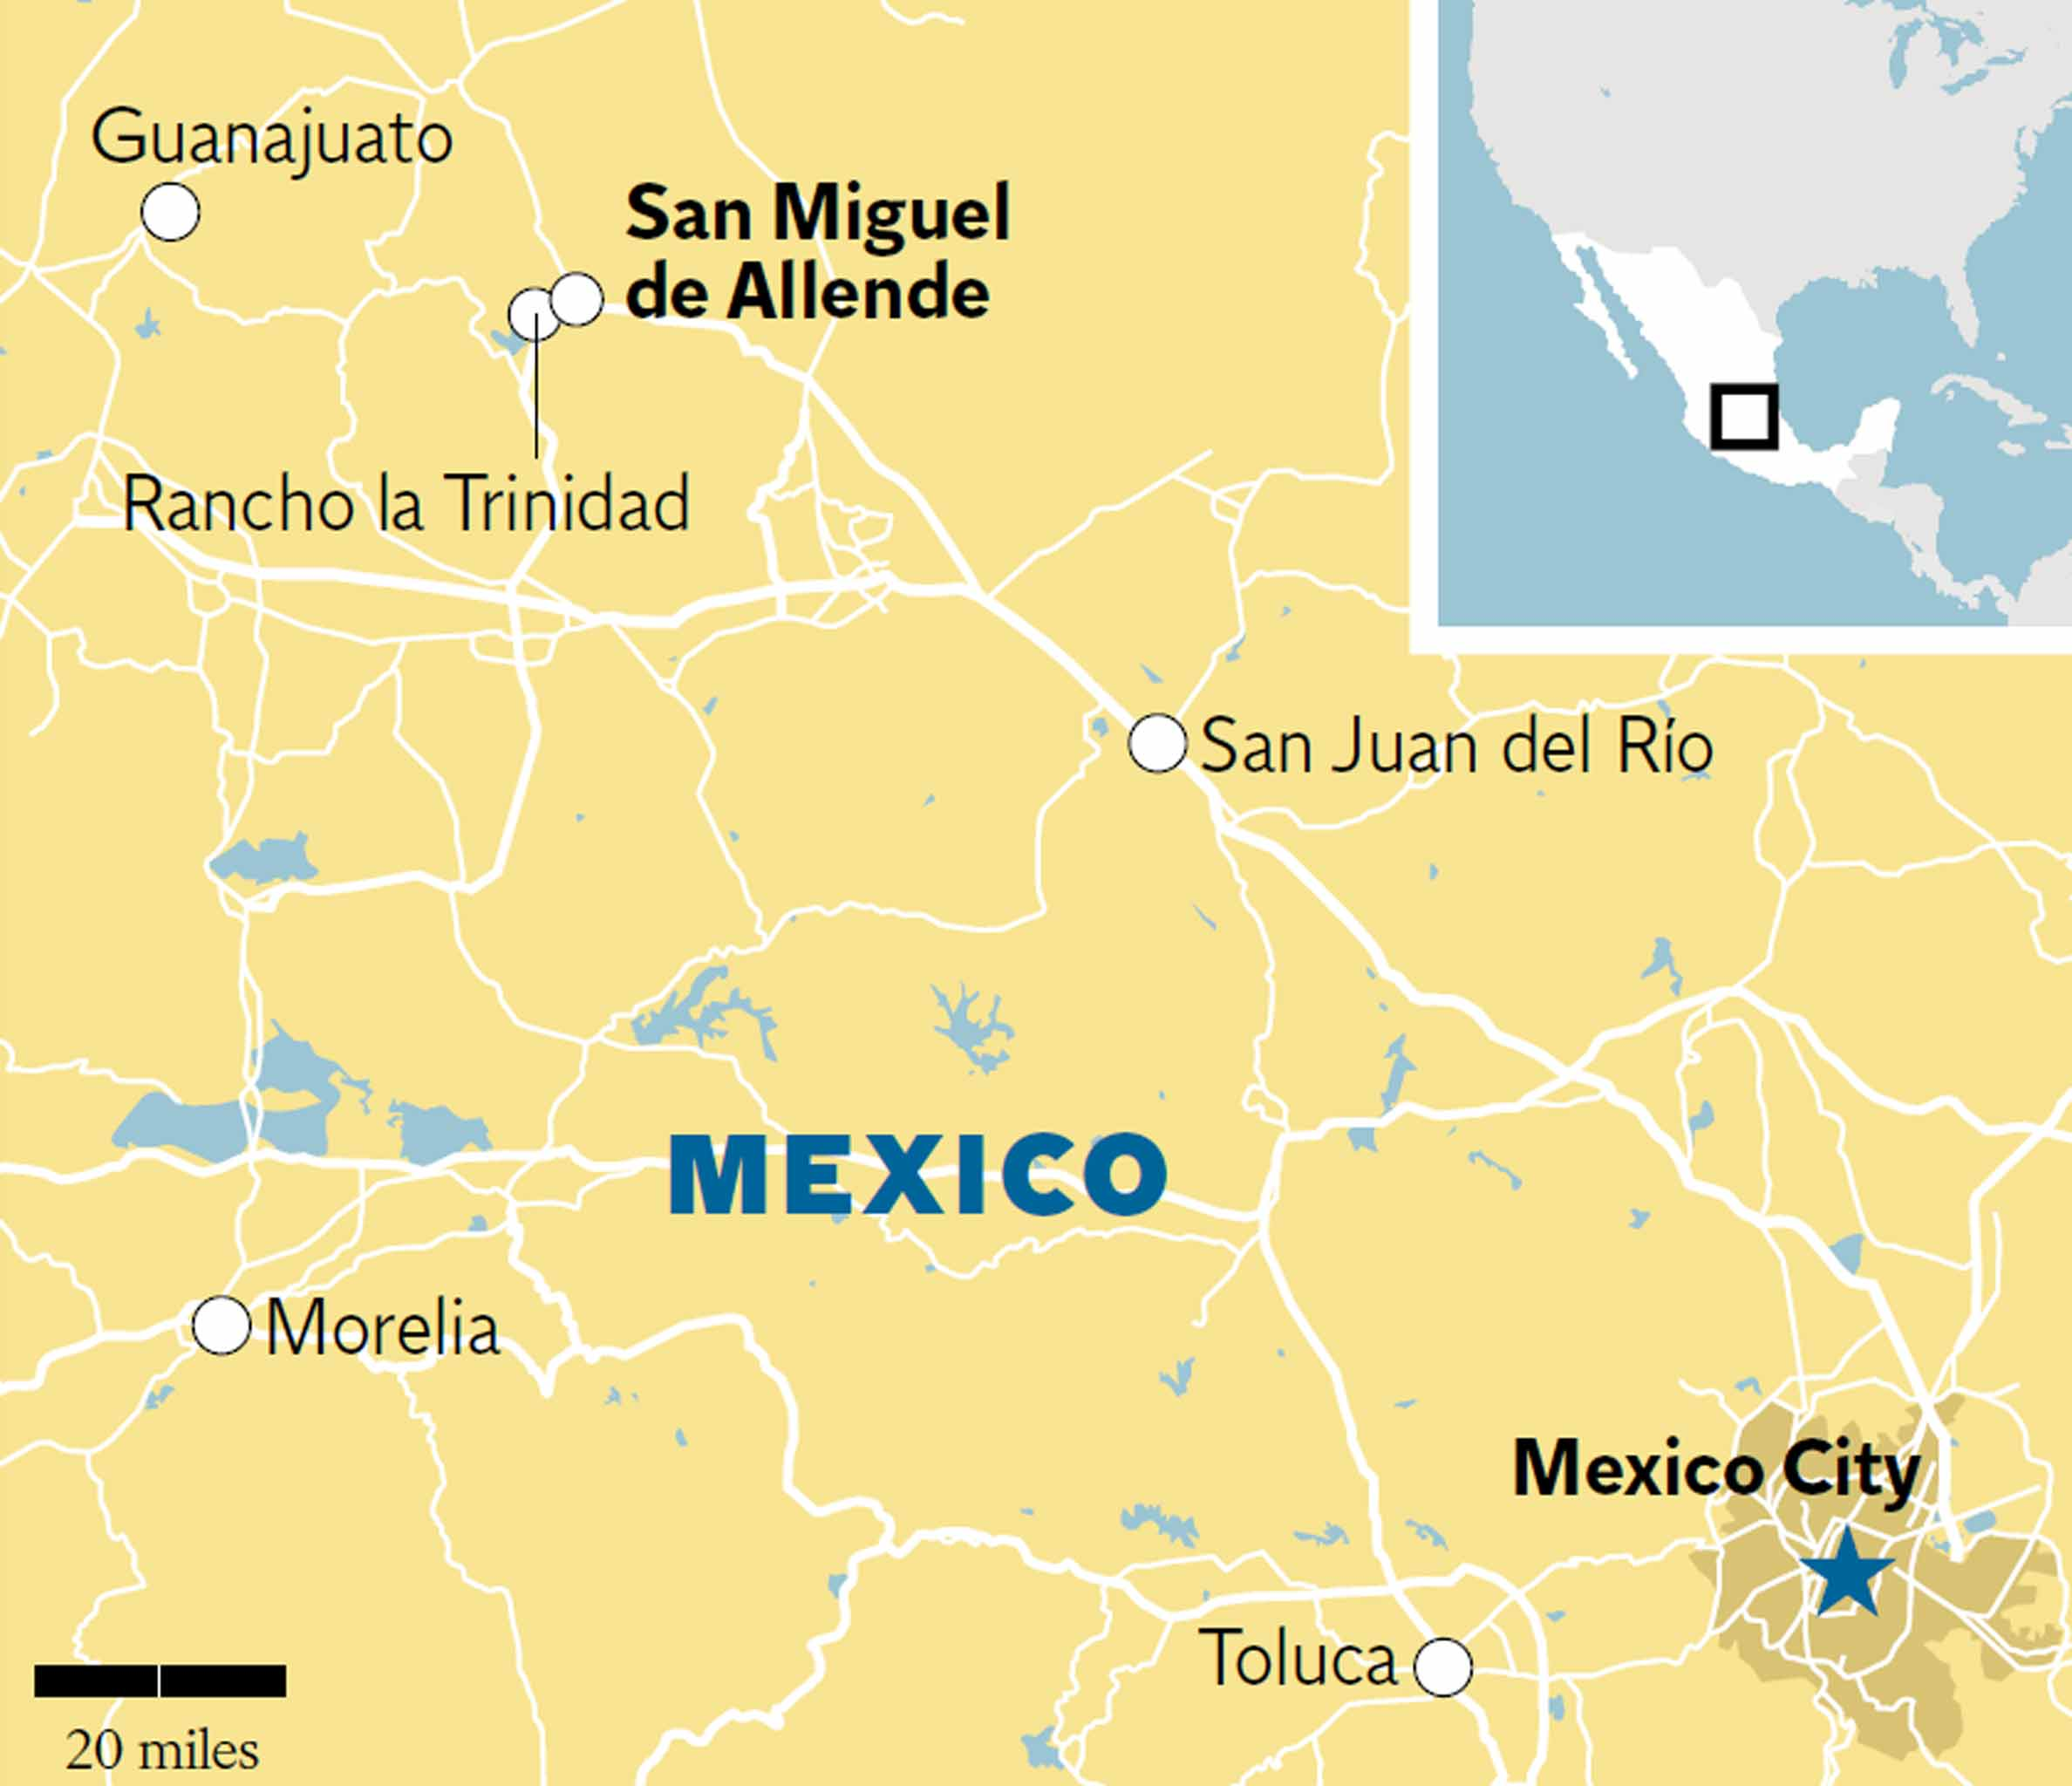 San Miguel de Allende: The new gourmet capital of Mexico ... on rio de janeiro map, rincon de guayabitos map, ixtapan de la sal map, queretaro map, real de catorce map, puerto vallarta map, ixtapa zihuatanejo map, hermosillo map, segovia spain on a map, mexico map, puebla on map, latin america map, chichen itza map, morelia map, cozumel map, san miguel county nm map, antigua guatemala map, buenos aires map, isla mujeres map, san cristobal de las casas map,